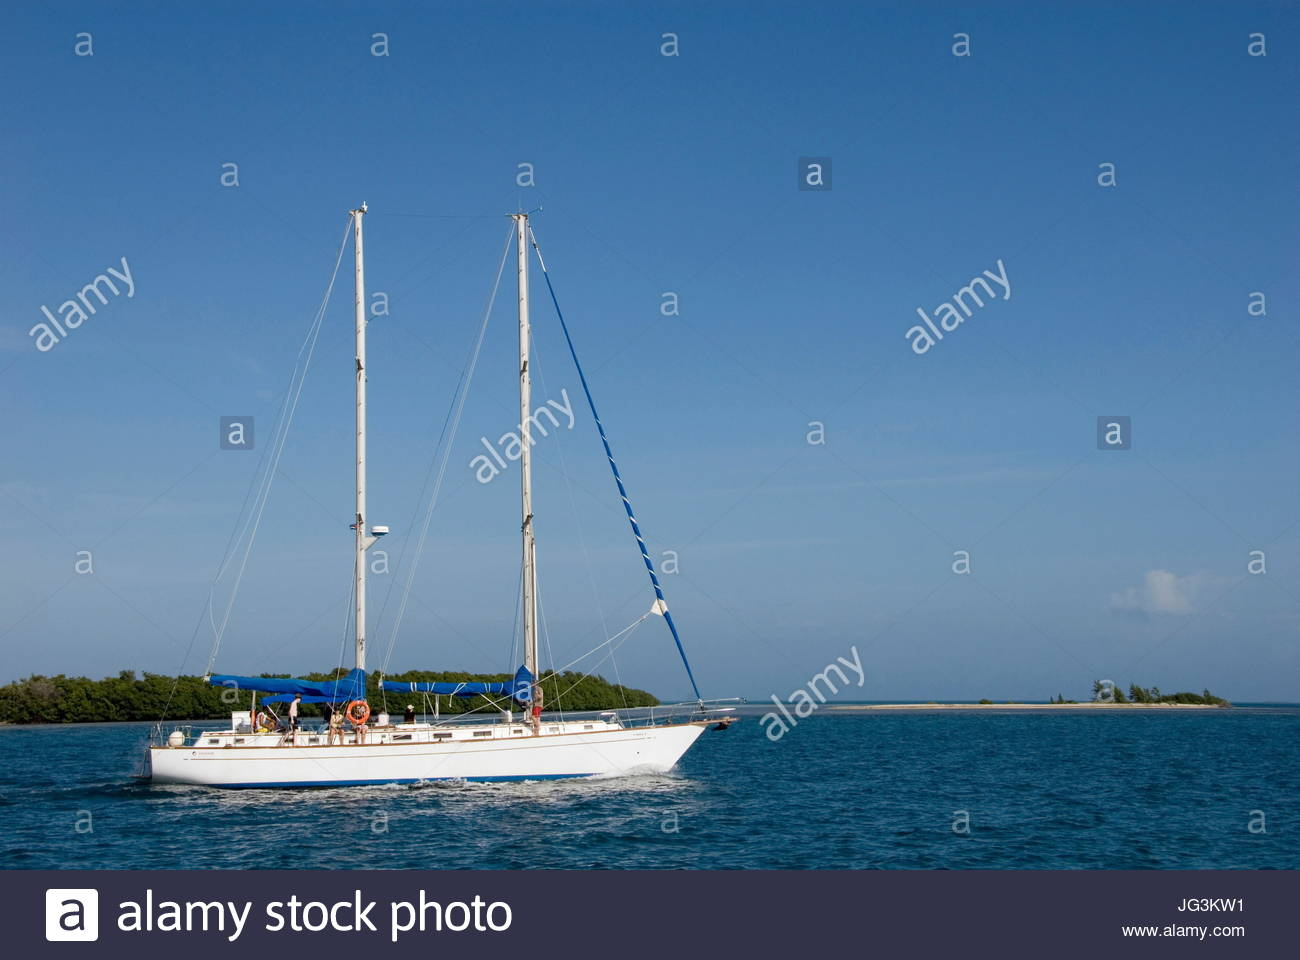 VP 5766518, Segelschiff, Varadero, Kuba, Karibik [Copyright-Hinweis: Frauke Scholz/McPHOTO/Vario Bilder] [jede Nutzung Stockbild